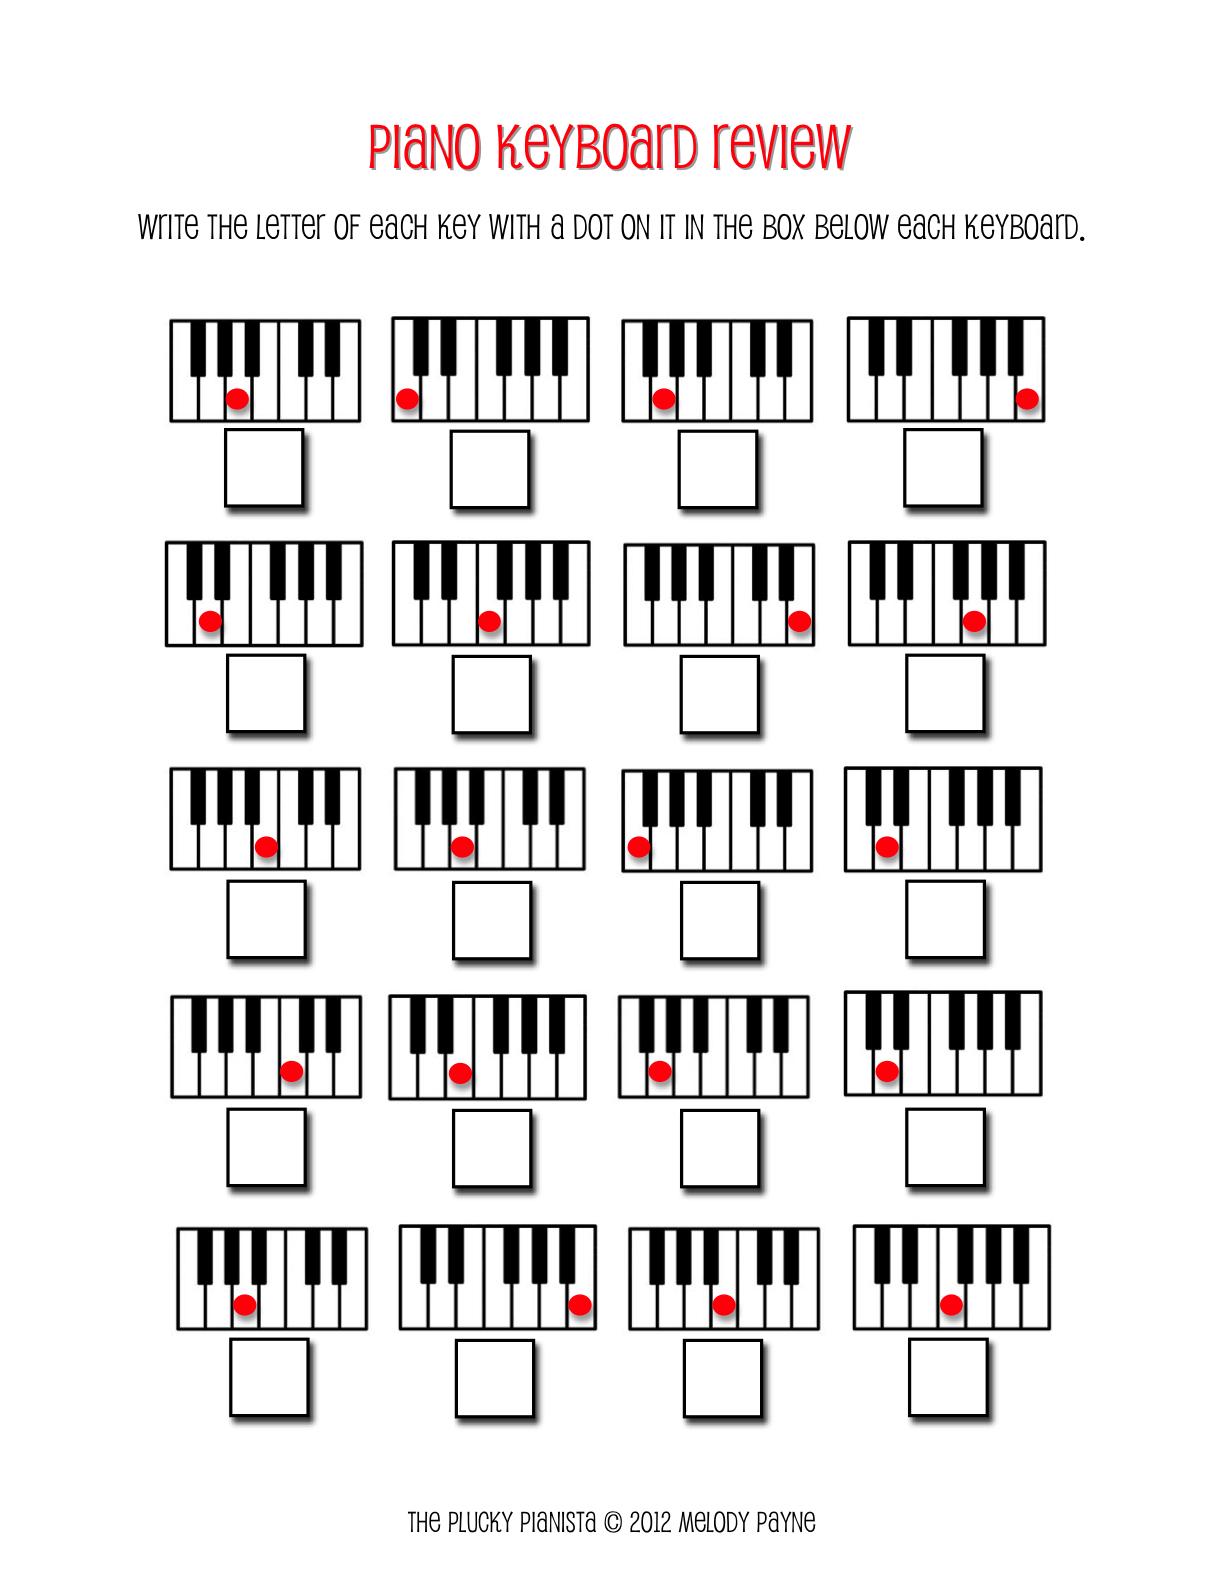 Piano Keyboard Review – Blank Keyboard Worksheet